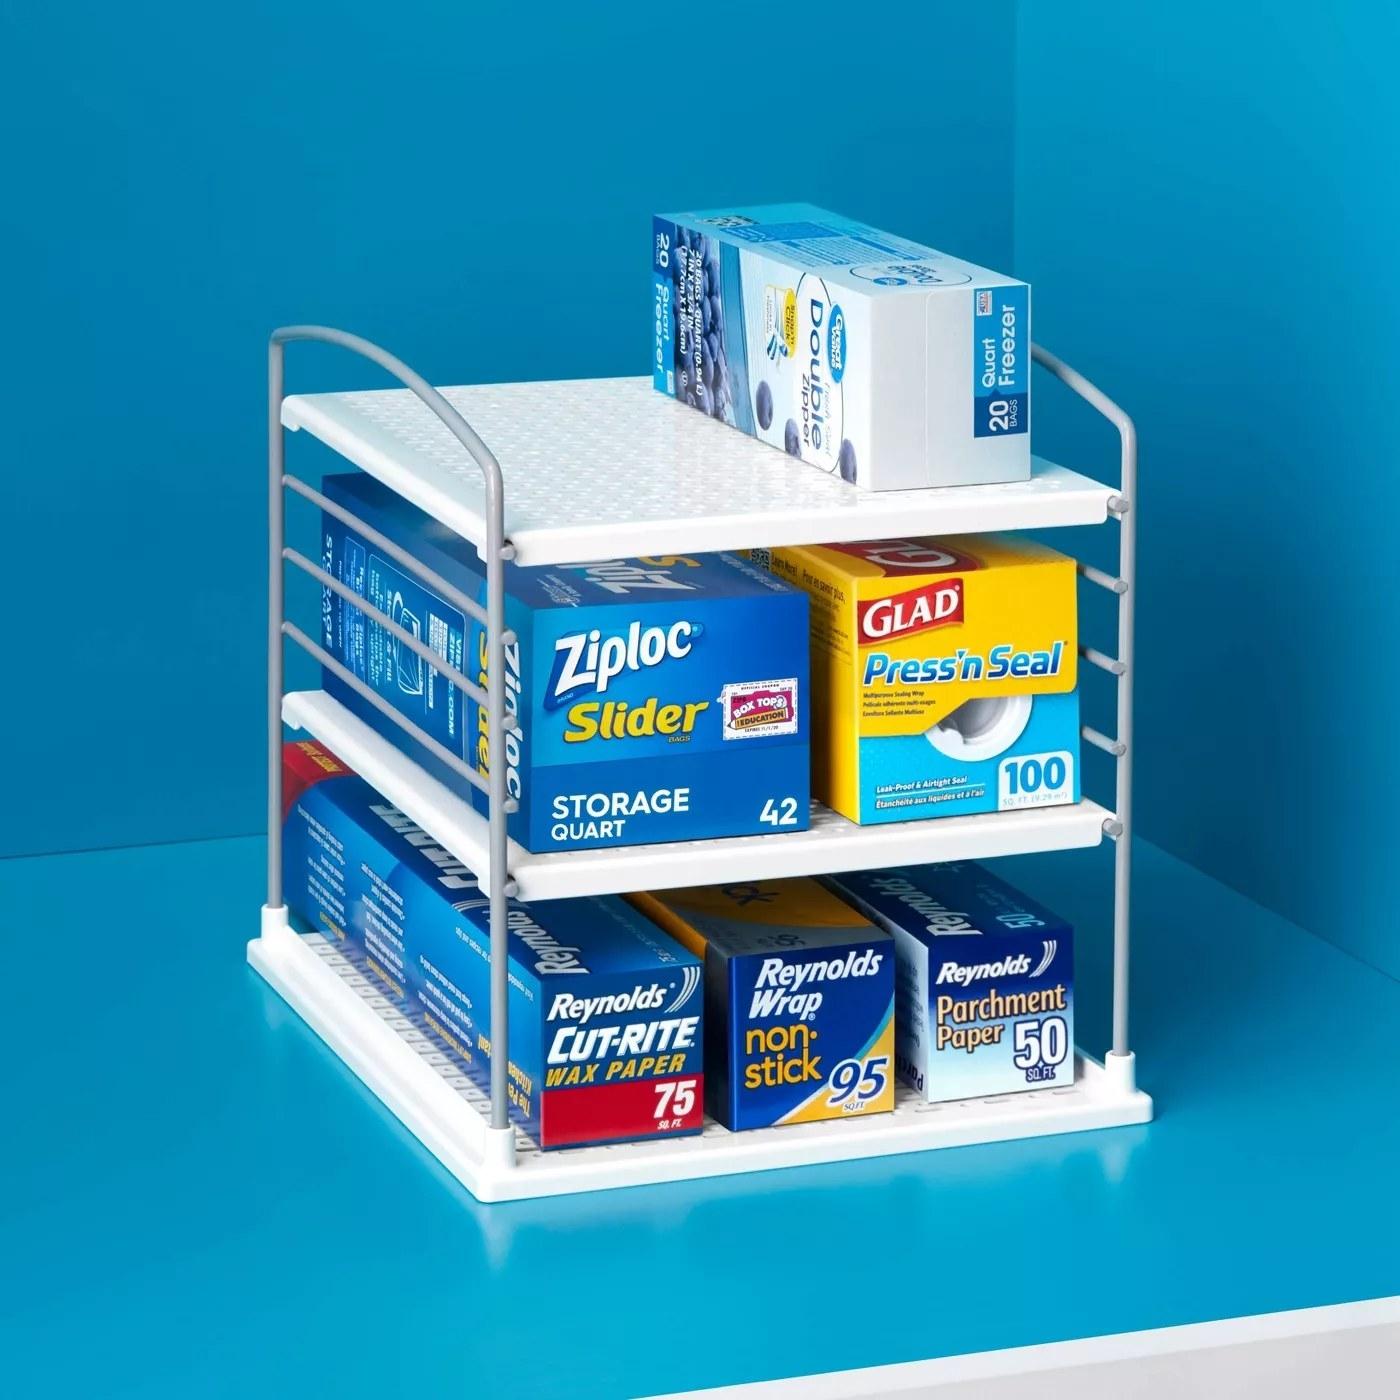 A box organizer